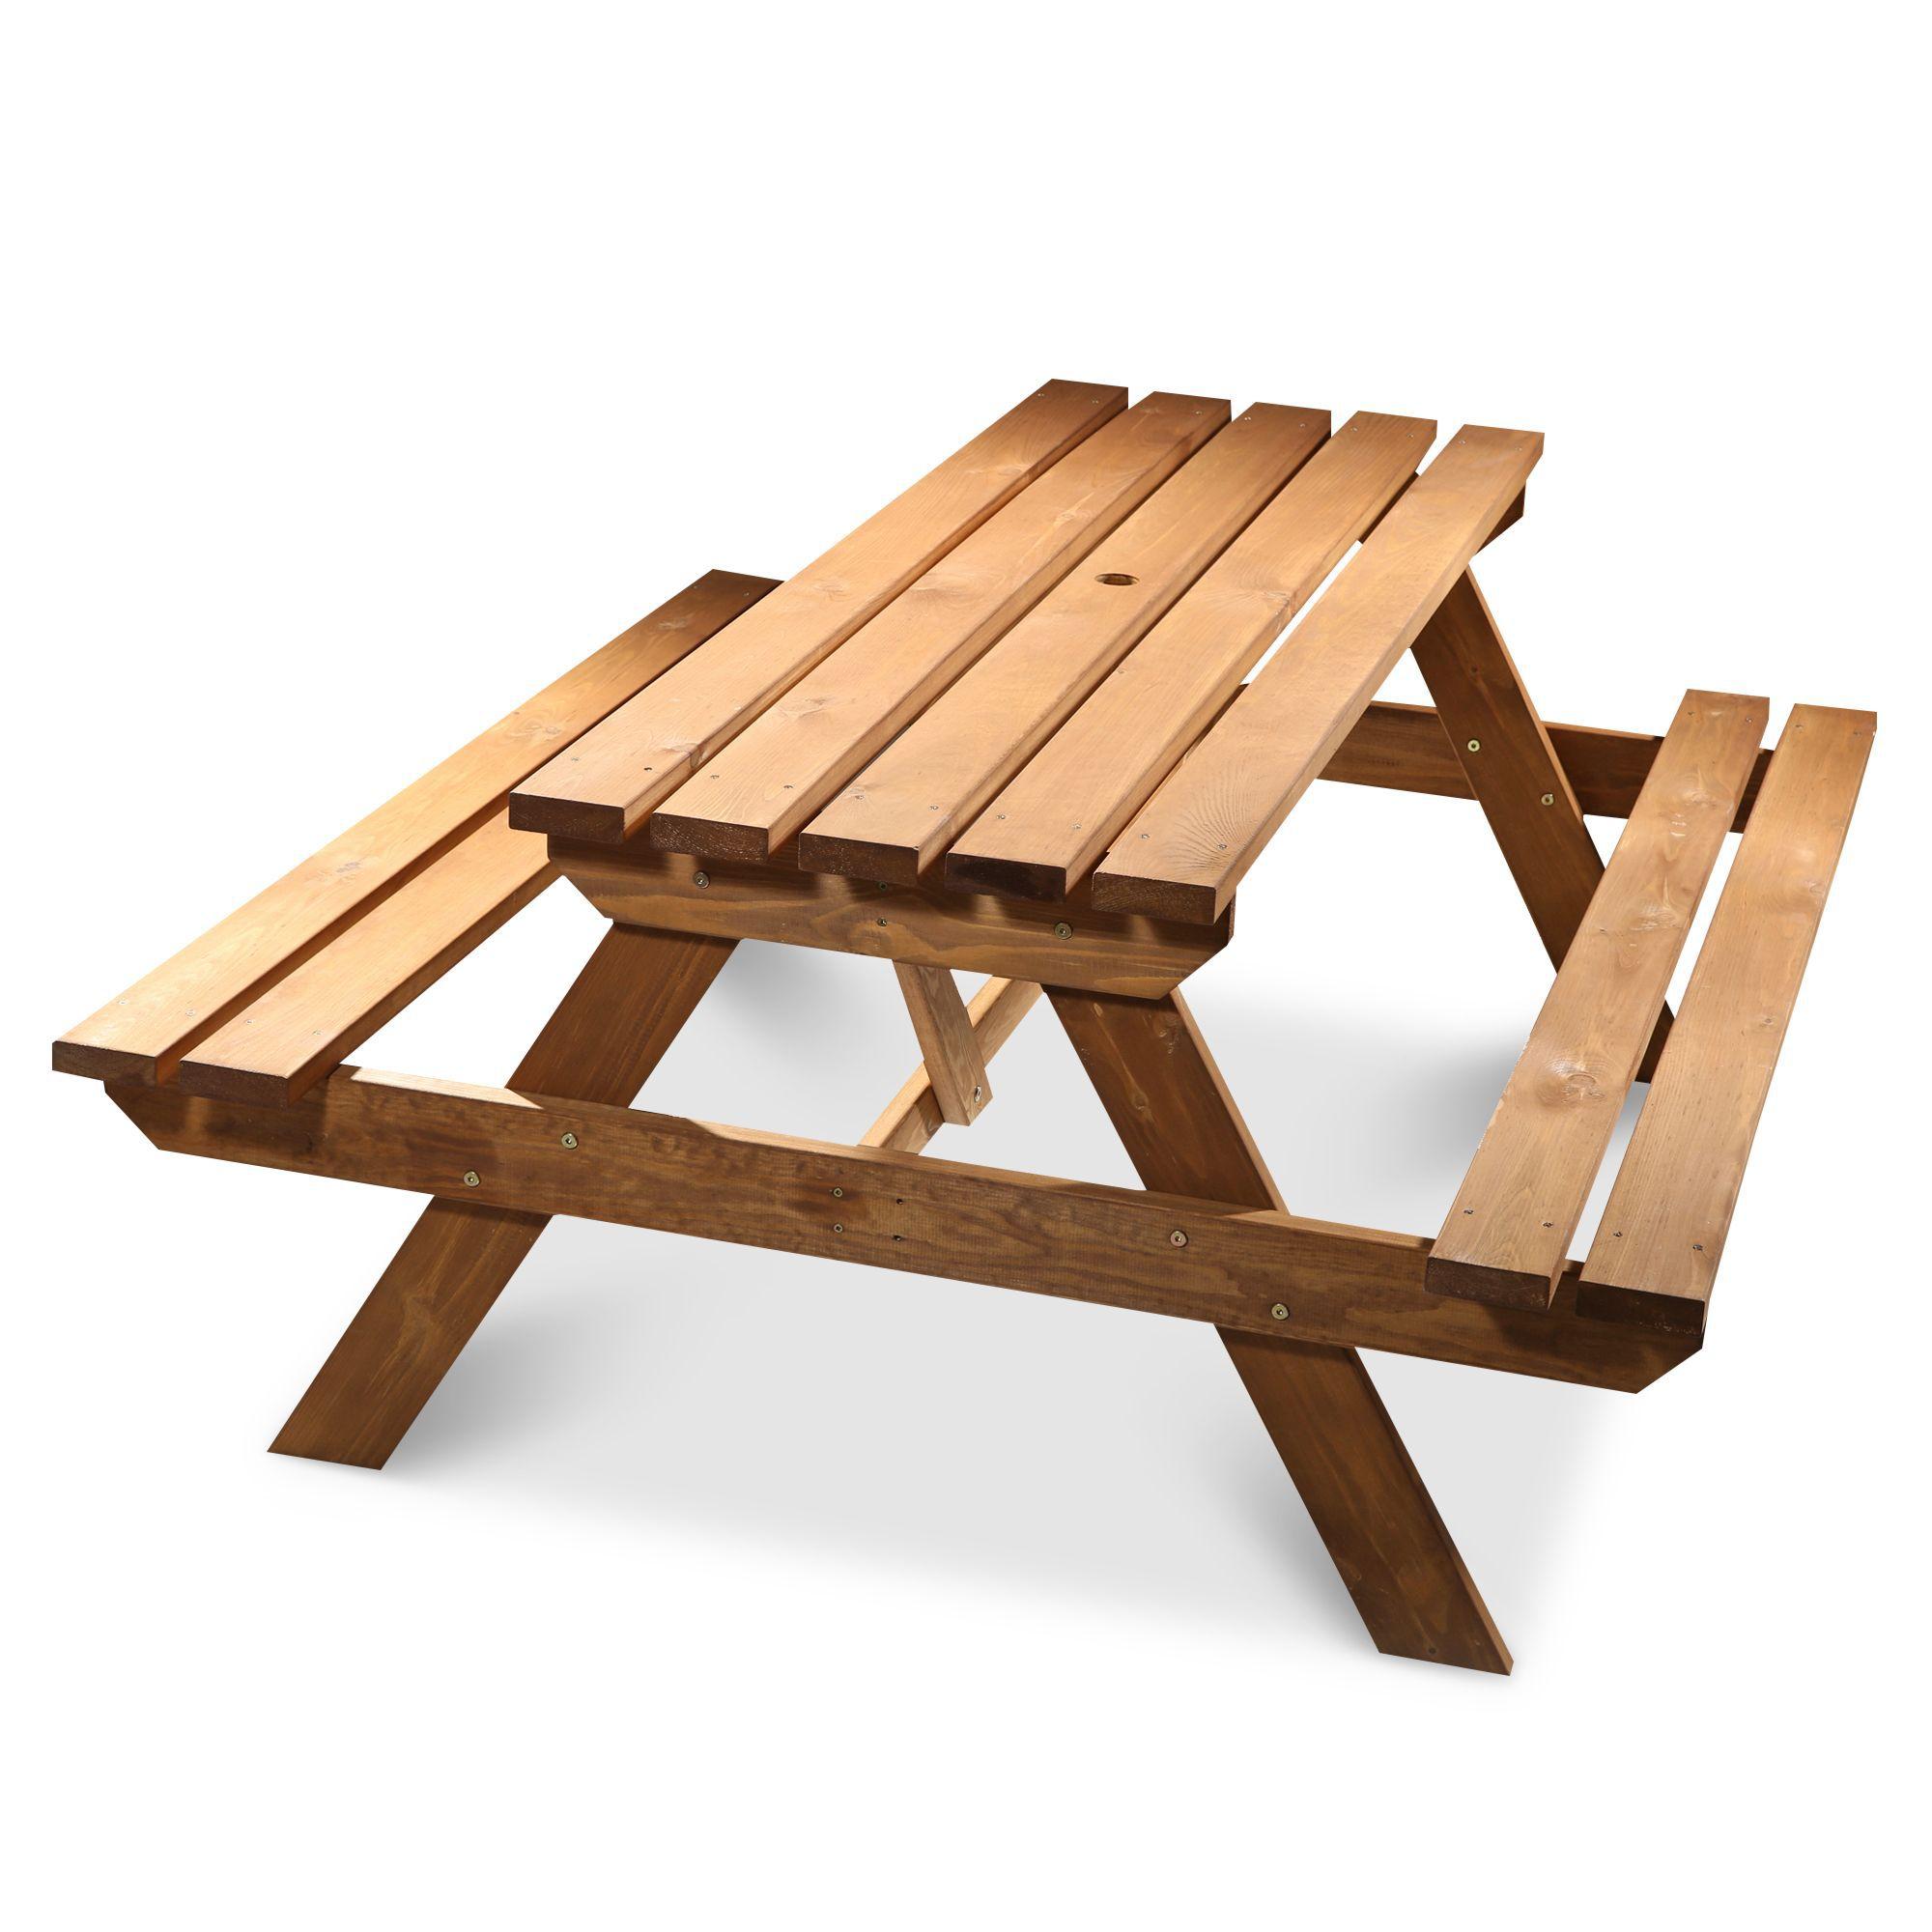 Agad Wooden Picnic Bench Departments Diy At B Q